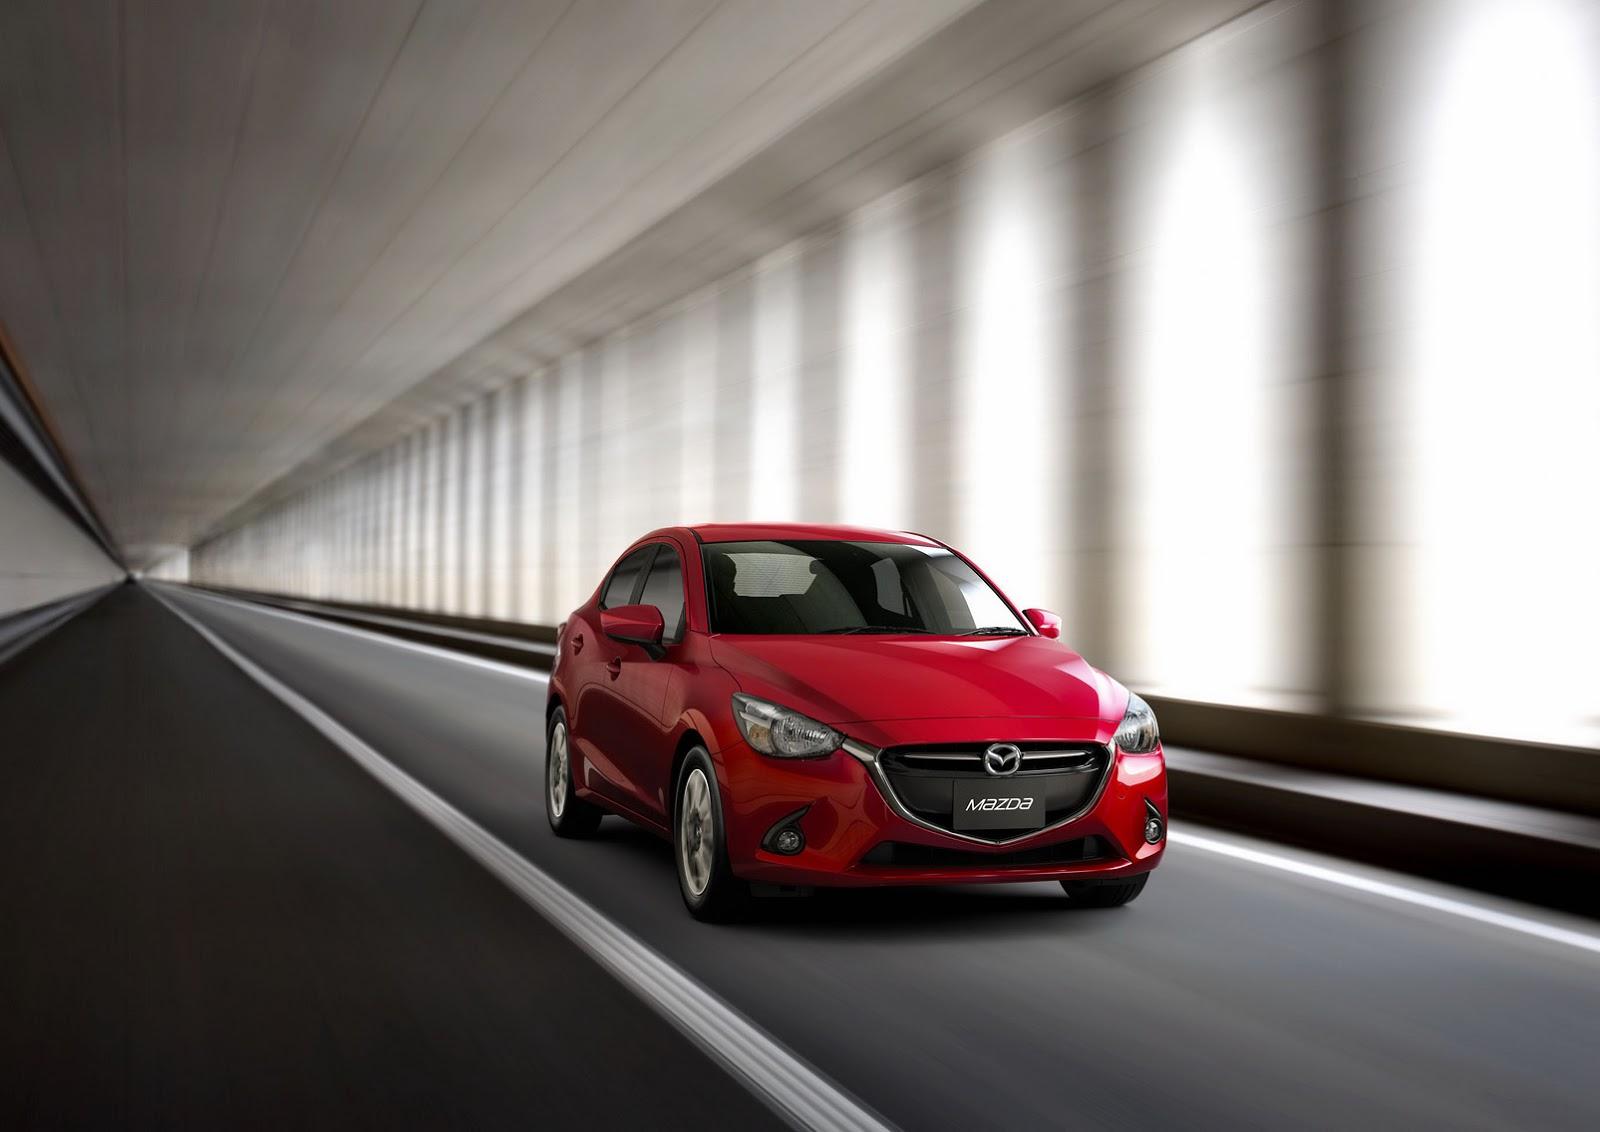 2016-Mazda2-Sedan-3.jpg